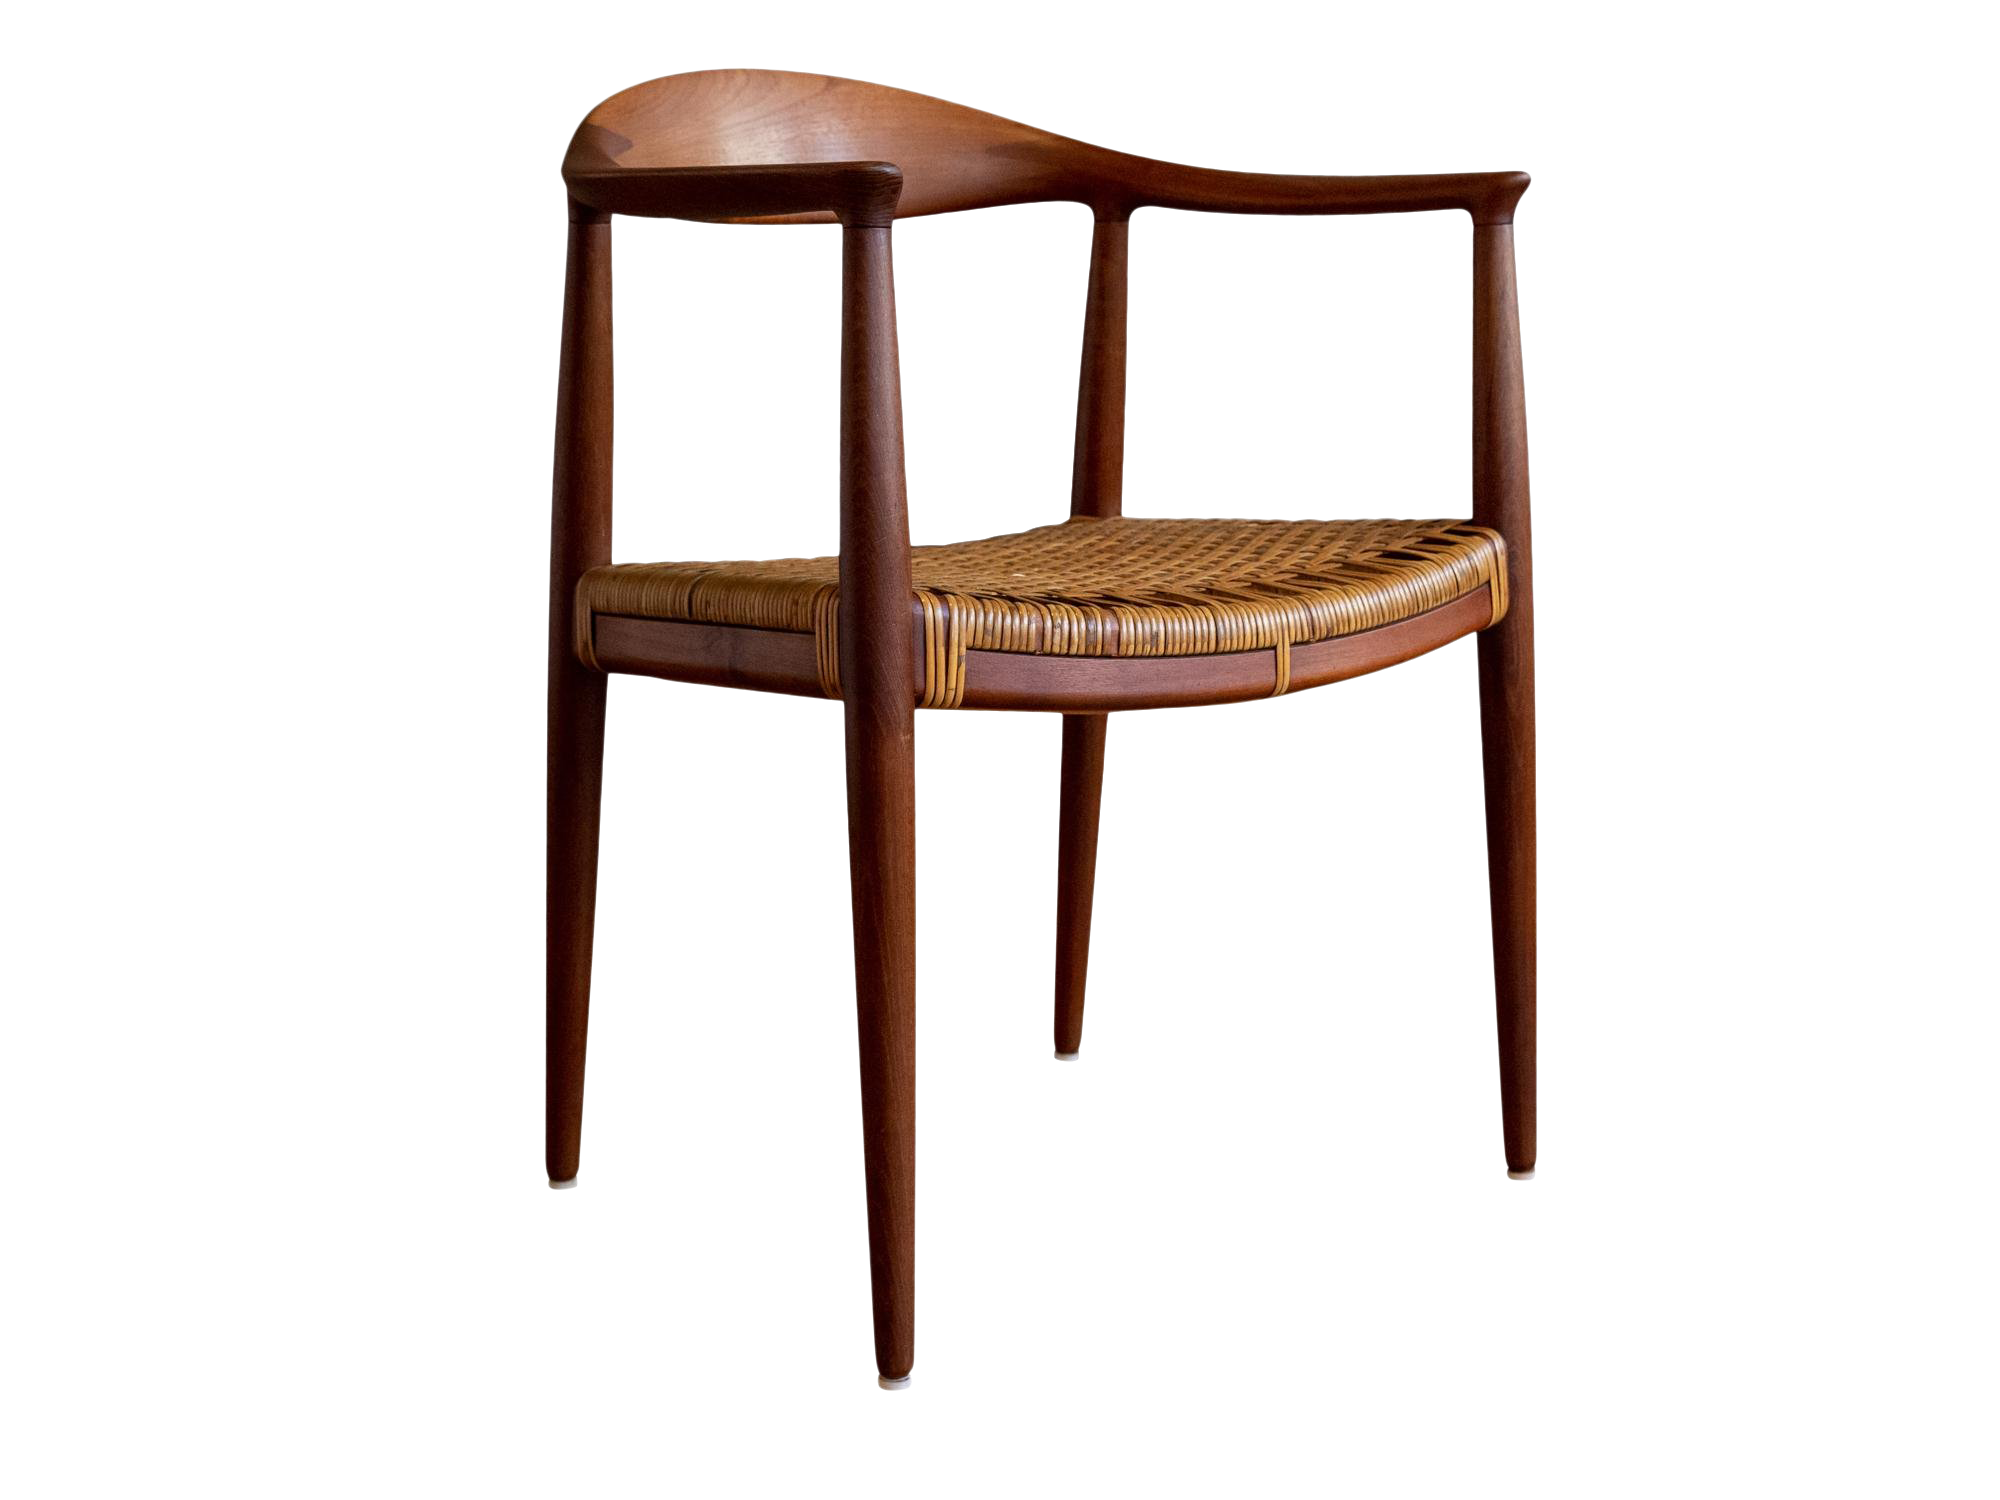 Exquisite Kennedy Teak Chair By Hans Wegner For Johannes Hansen